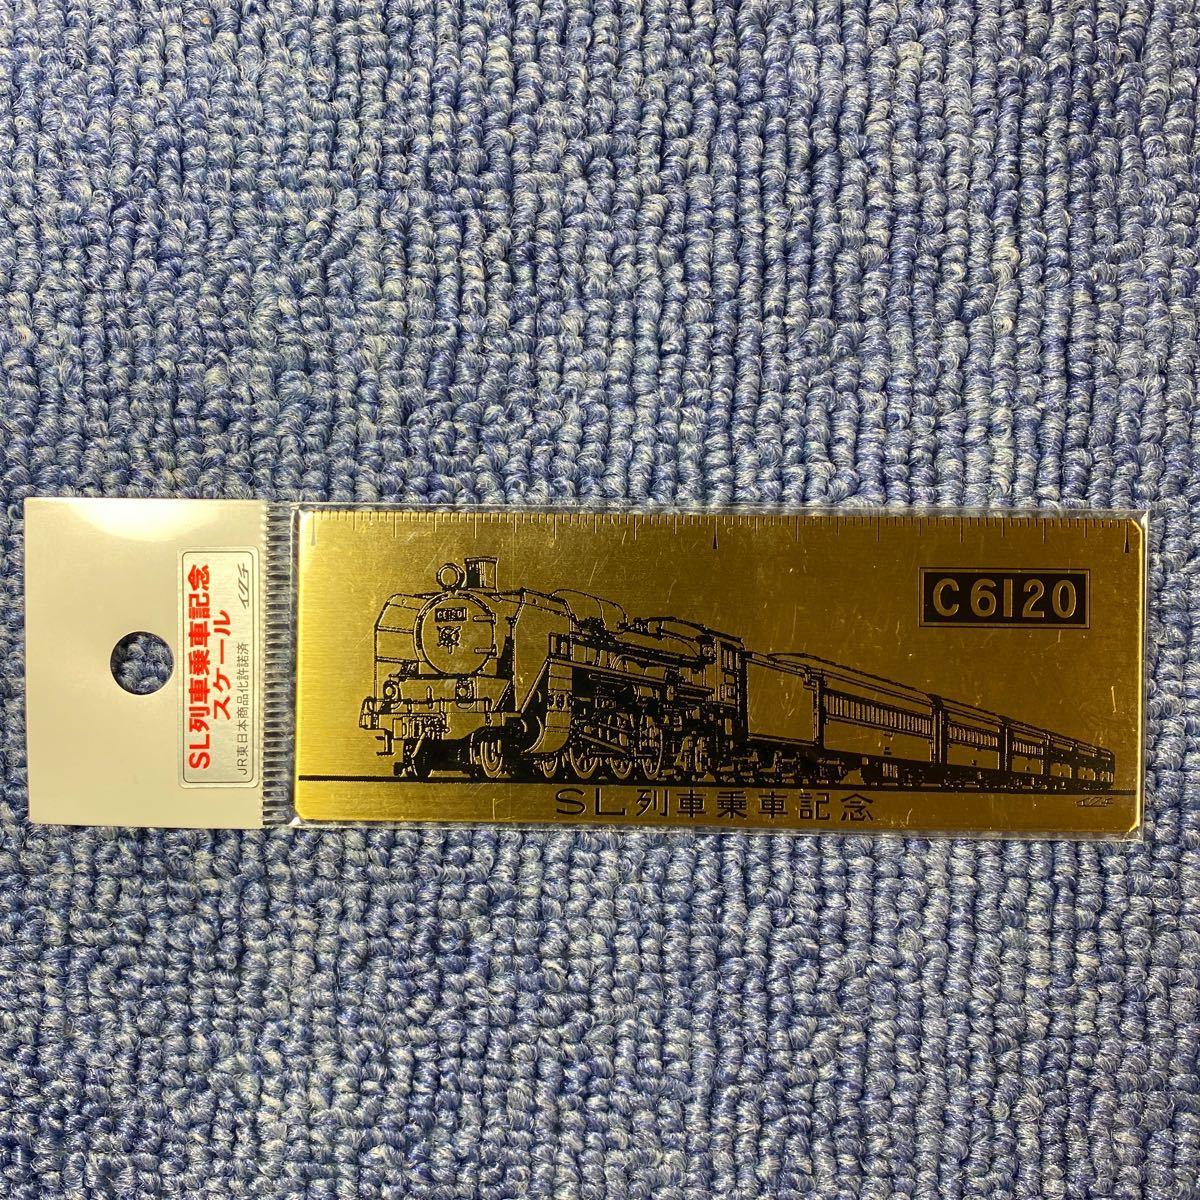 SL列車乗車記念 イクチ C6120 蒸気機関車 ゴールド 金属 定規 JR東日本承認 電車 鉄道グッズ コレクション レア 未使用_画像2